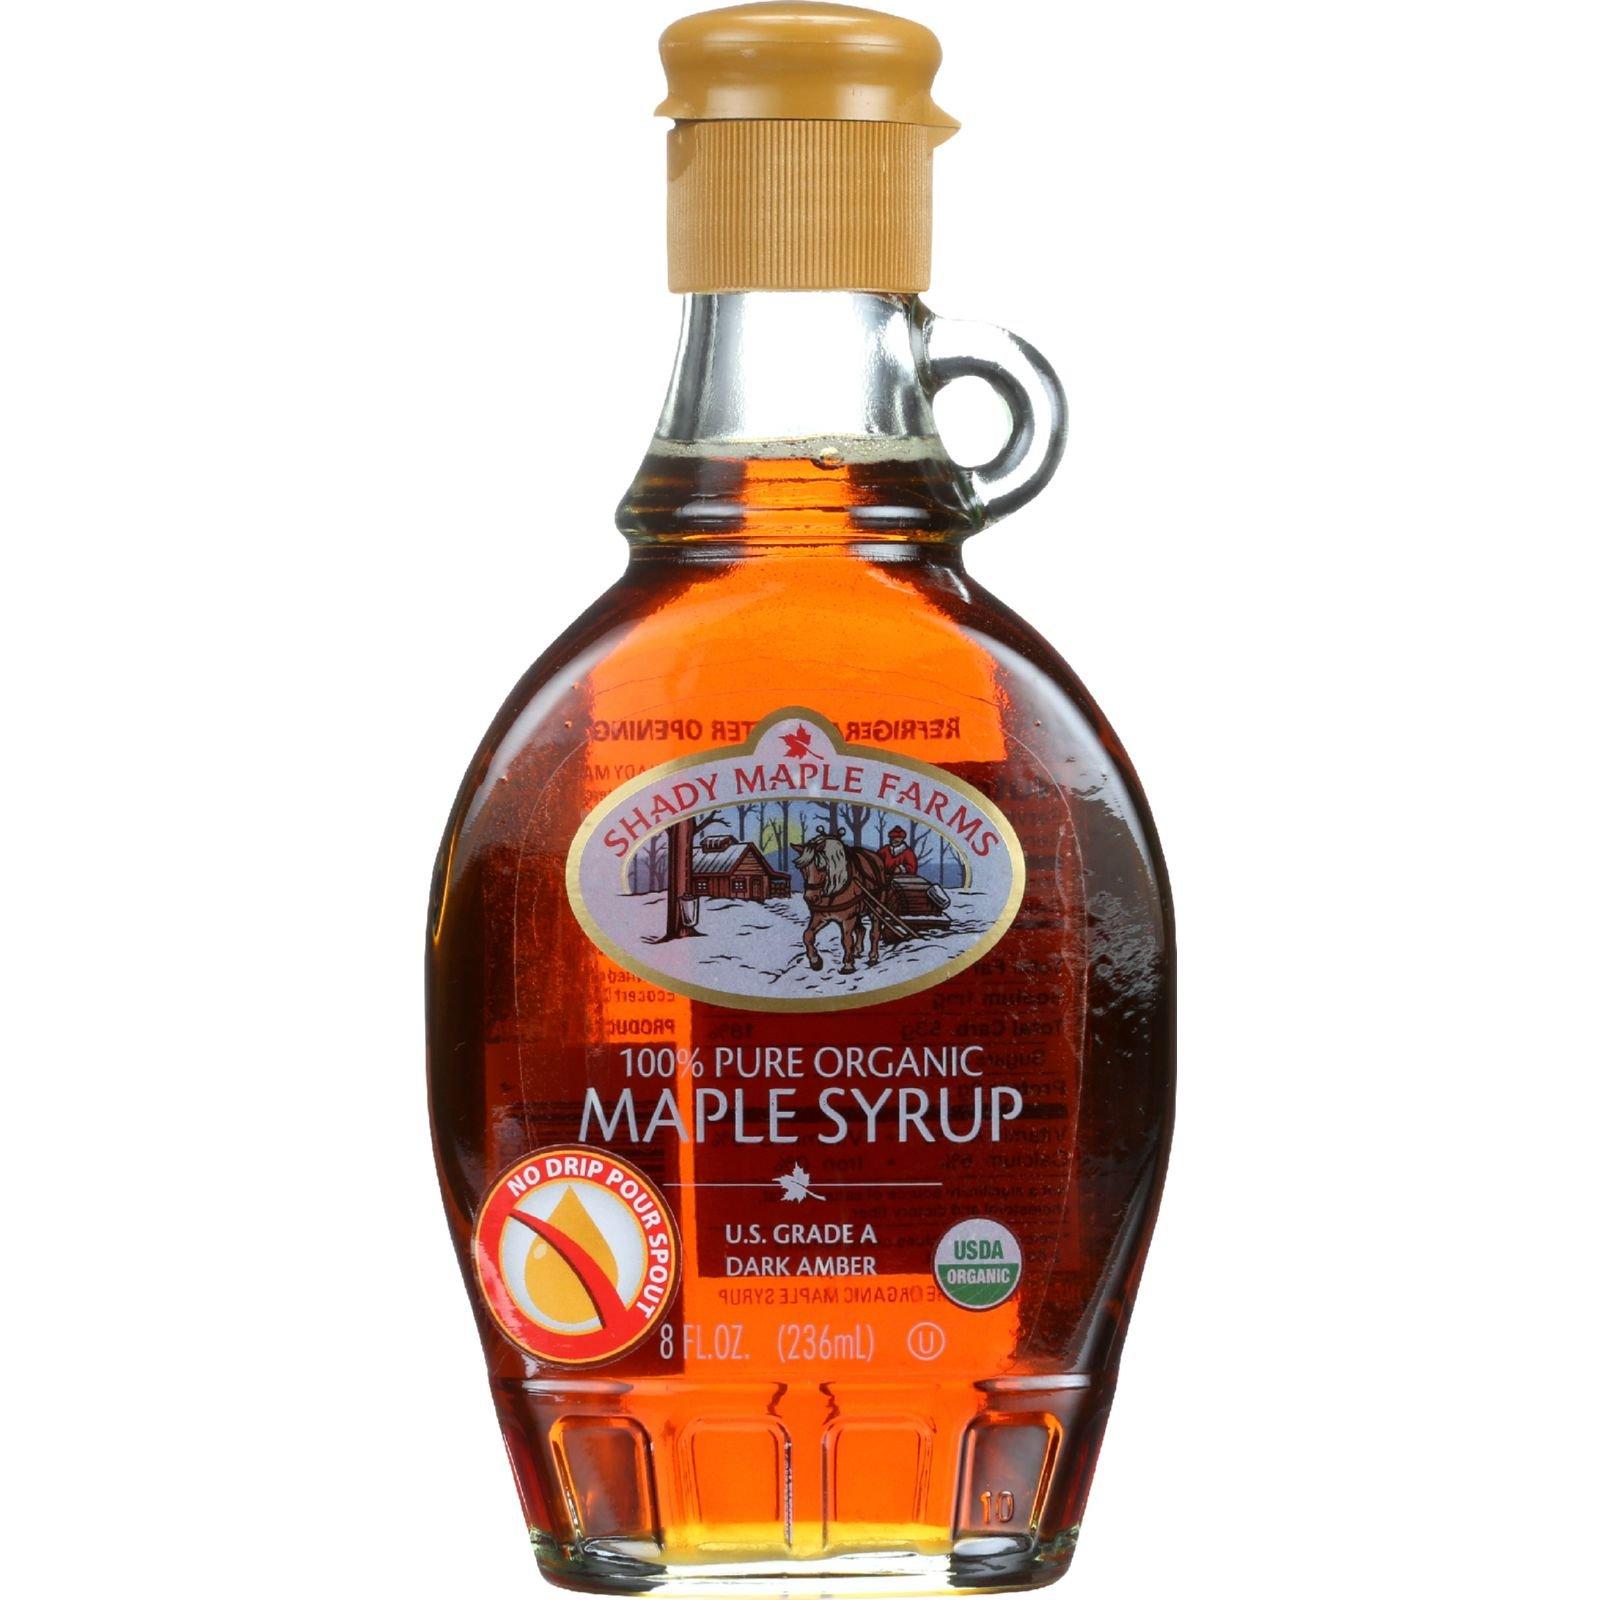 Shady Maple Farms Maple Syrup - Organic - Grade A - Dark - 8.0 oz - Case of 12 - 100% Pure